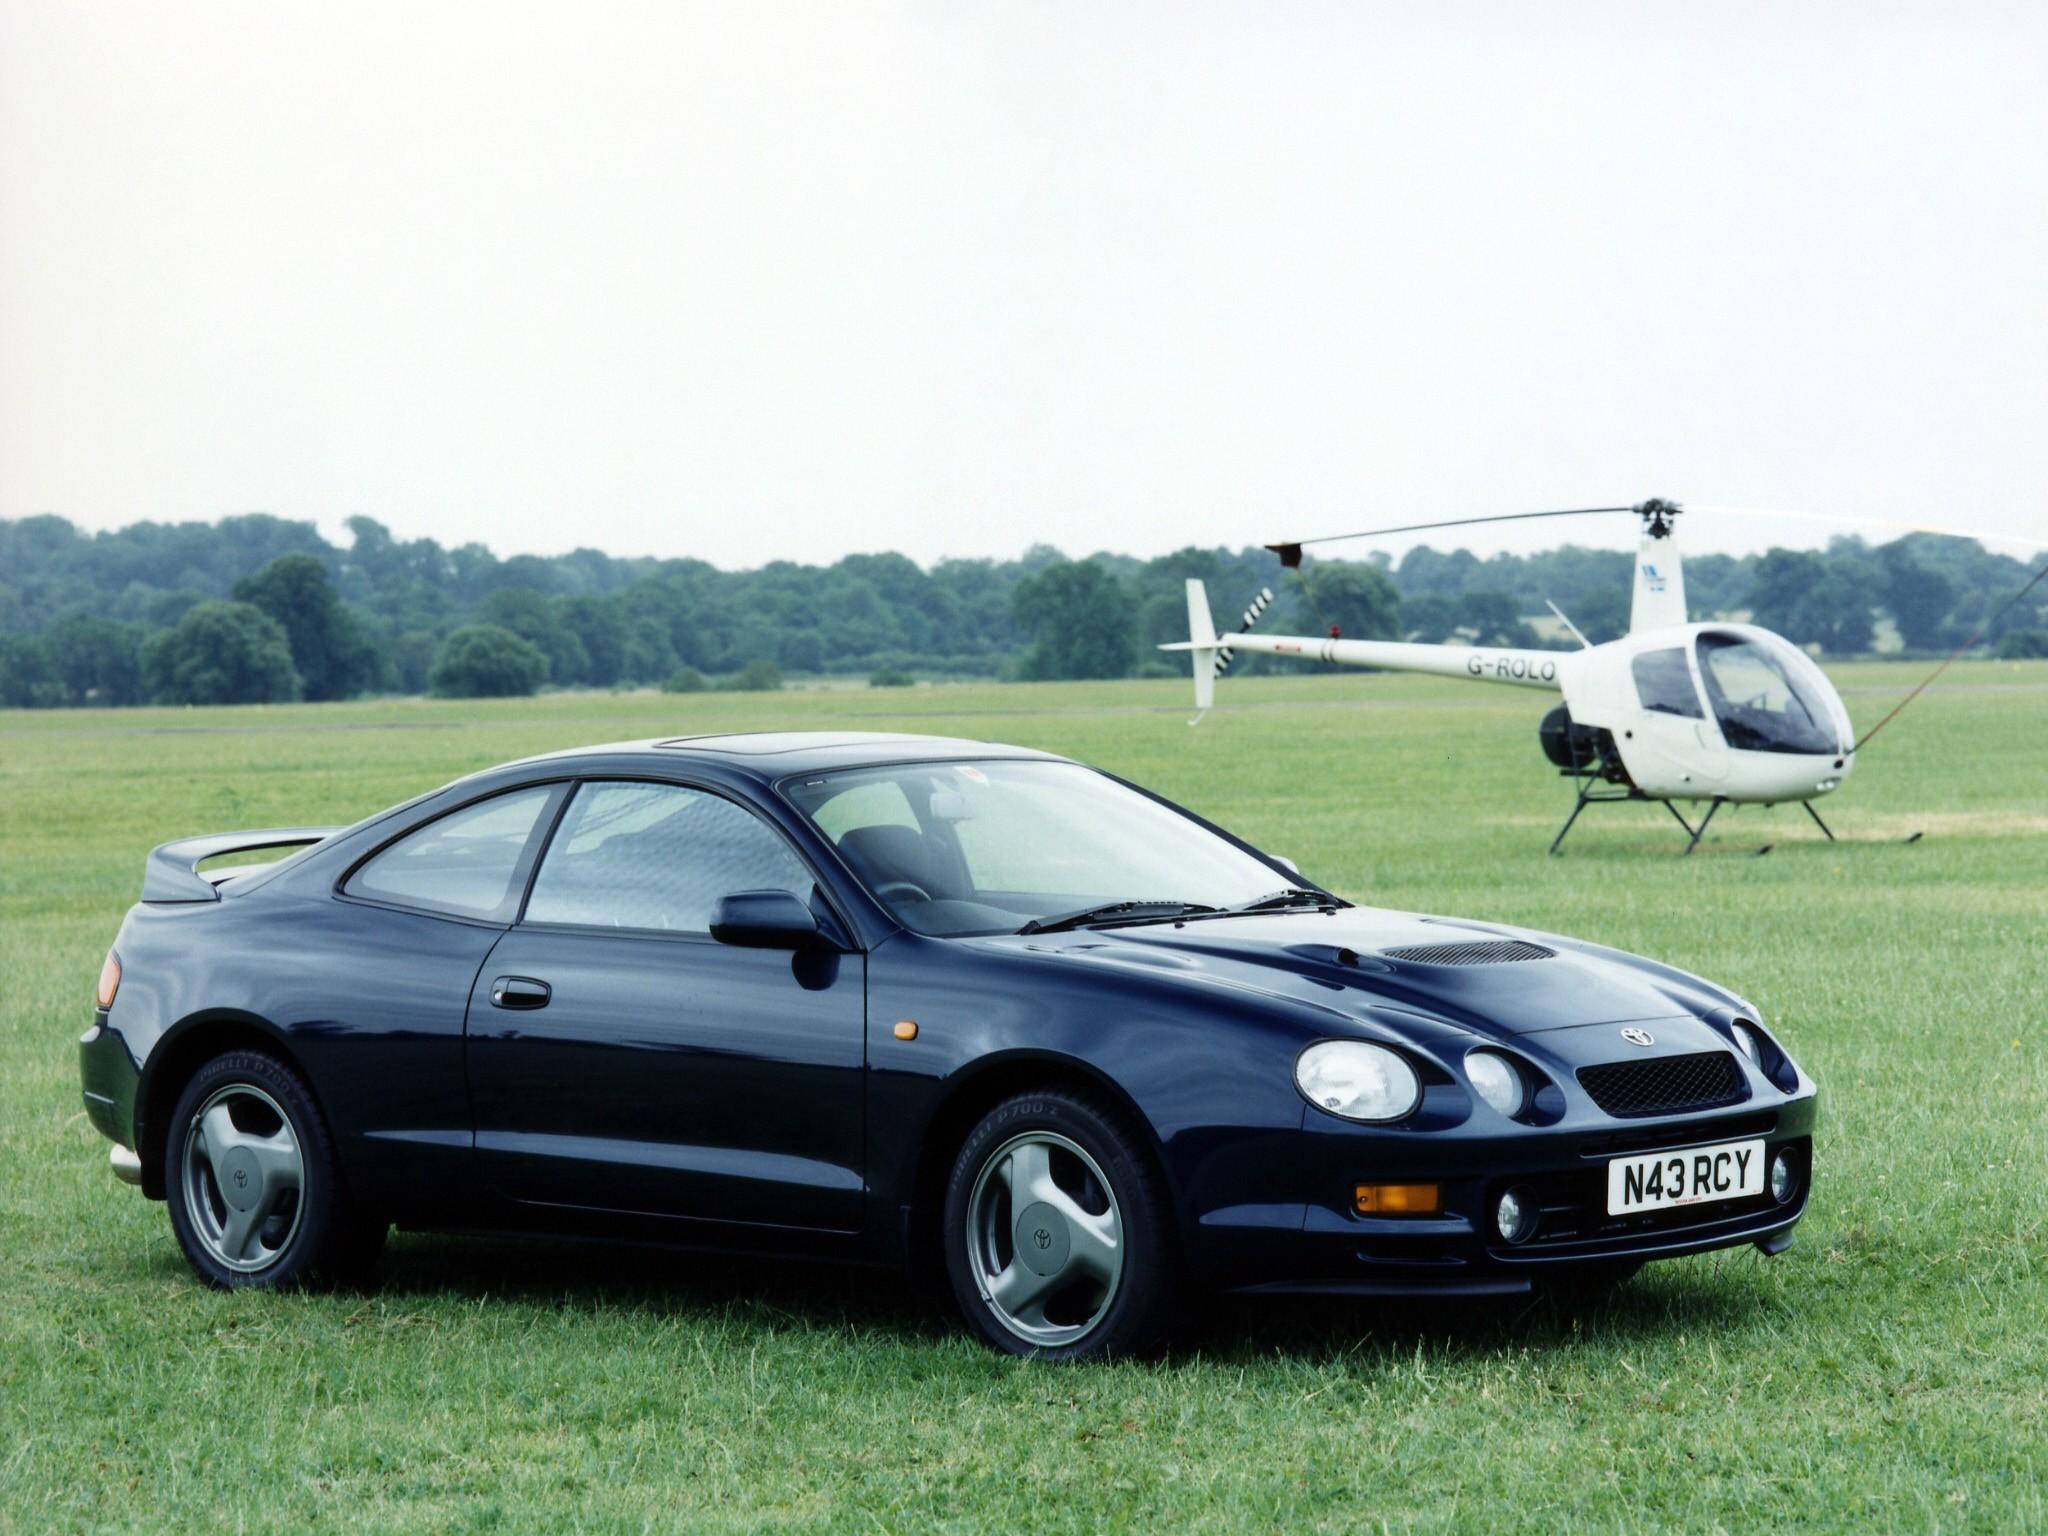 Awd Cars For Sale >> TOYOTA Celica specs - 1994, 1995, 1996, 1997, 1998, 1999 - autoevolution